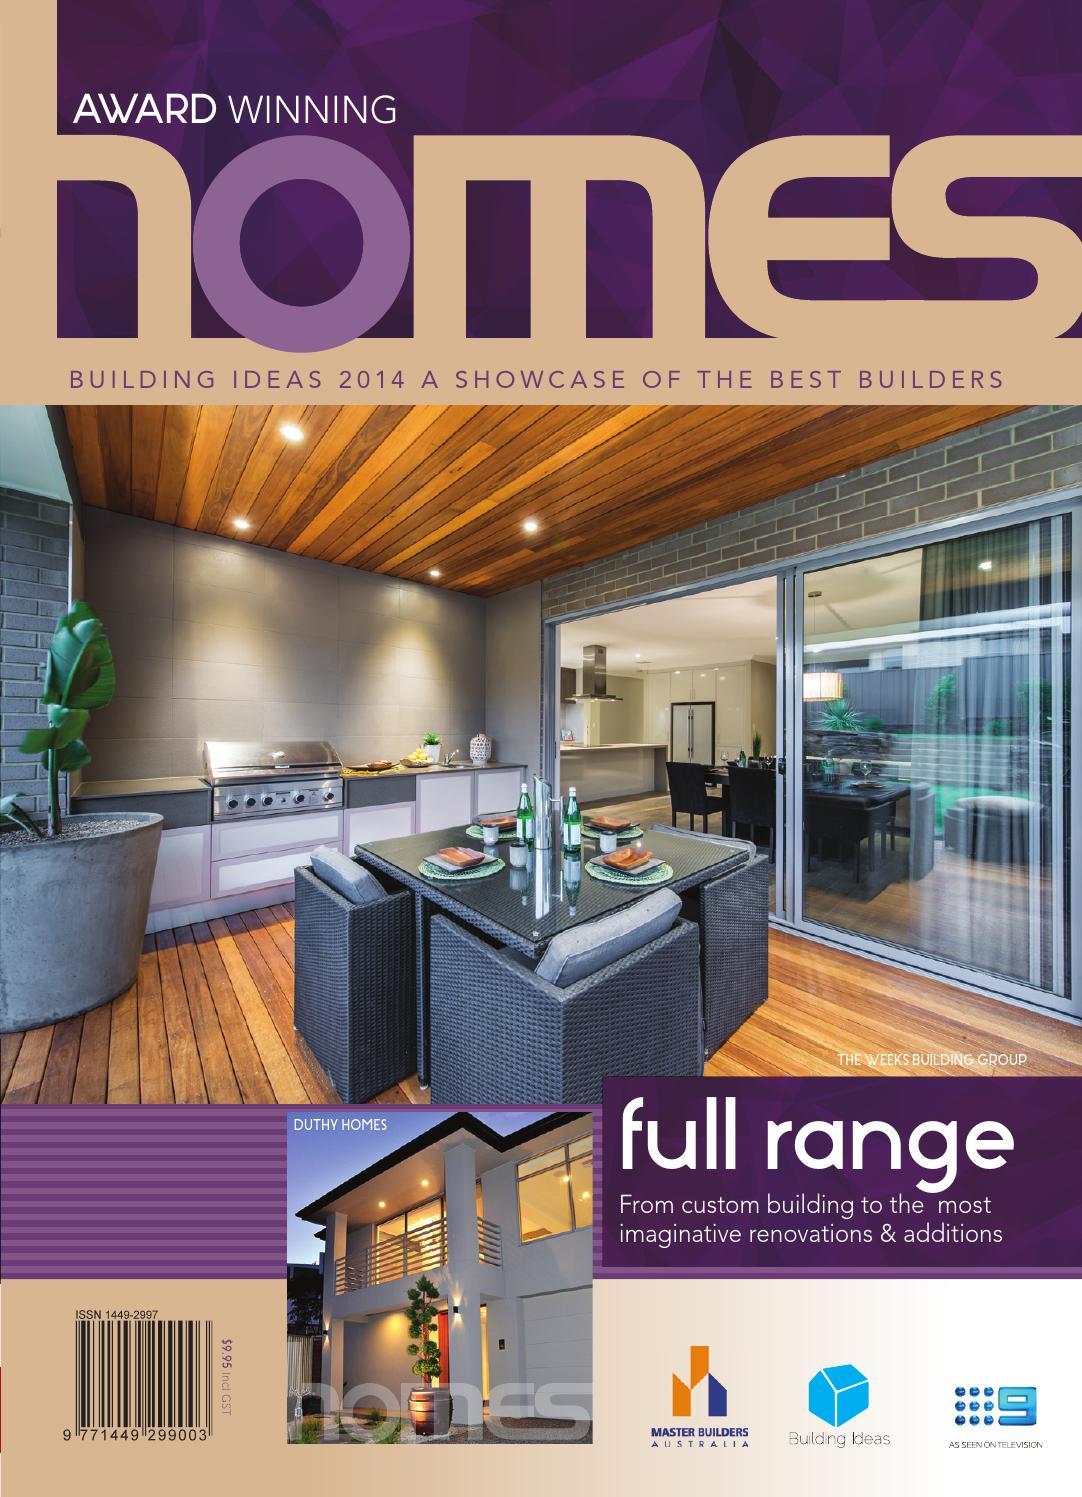 Energy Efficient Home Builders South Australia - House Plans ... on